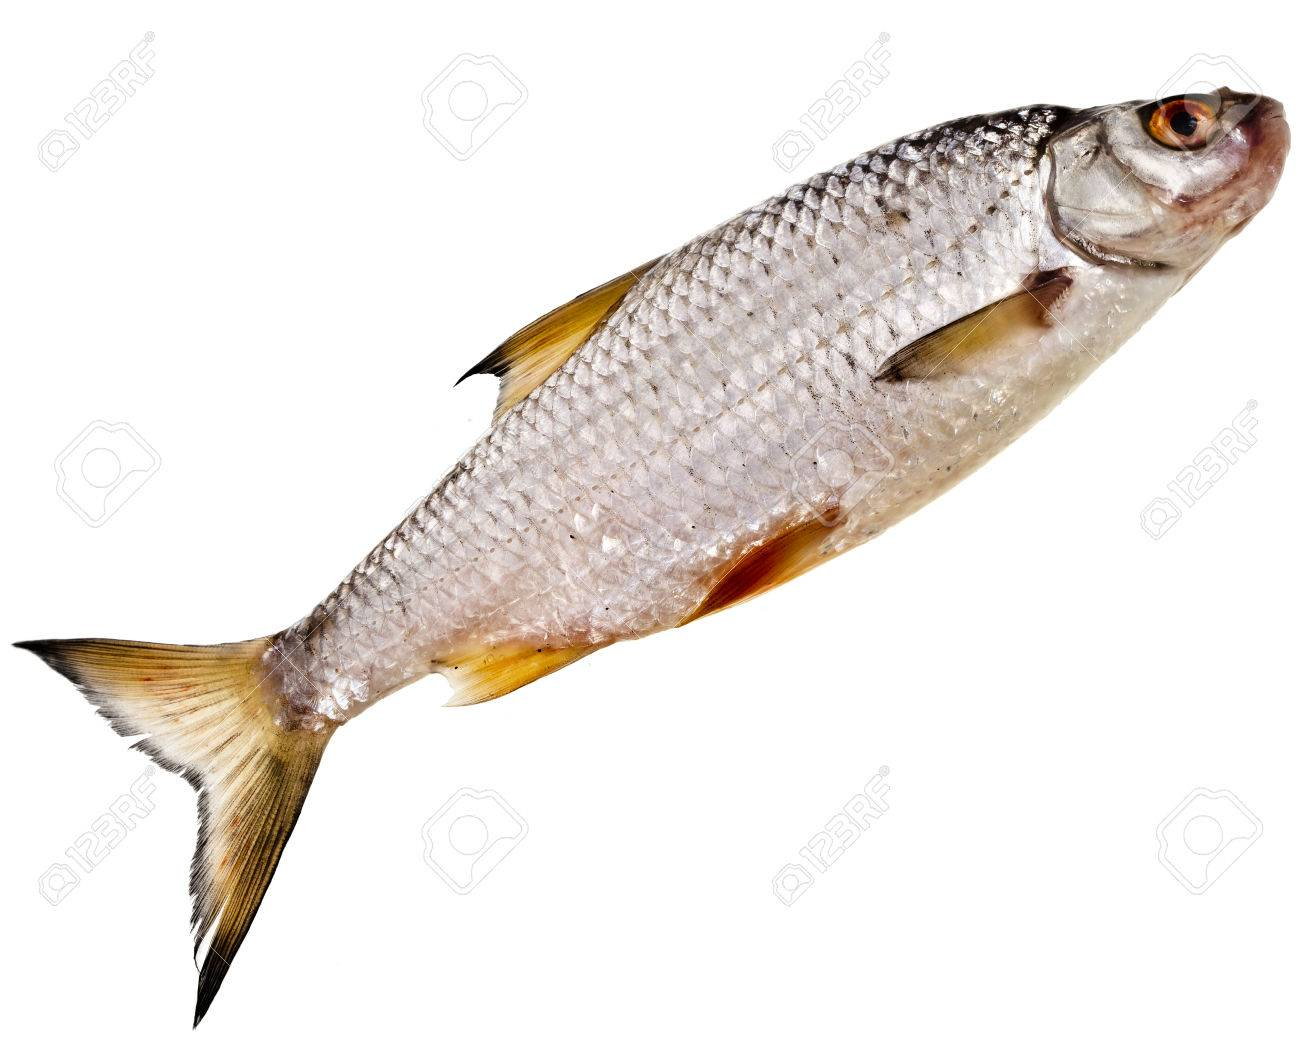 Freshwater fish bream - Animal Big Bream Carp Catch Closeup Cooking Delicacy